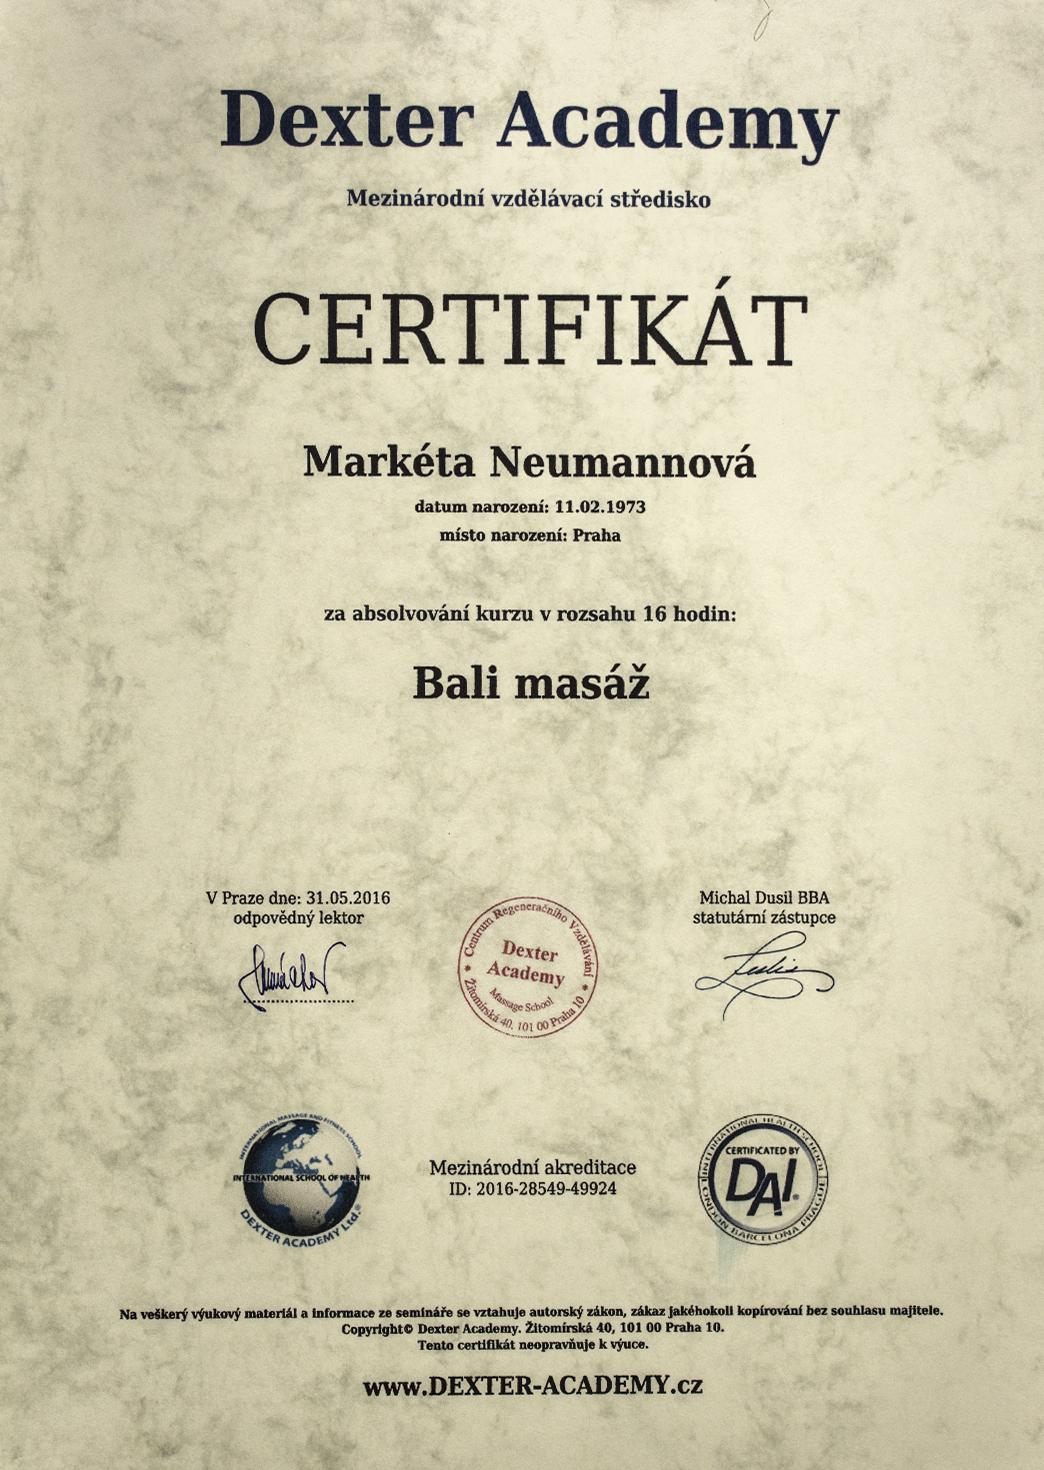 certifikaty-a-odbornosti-marketa-neumannovalecitelka-terapeutkamasazebiorezonancedetoxikacefrekvencni-terapie-benatky-nad-jizeroubali-masaz